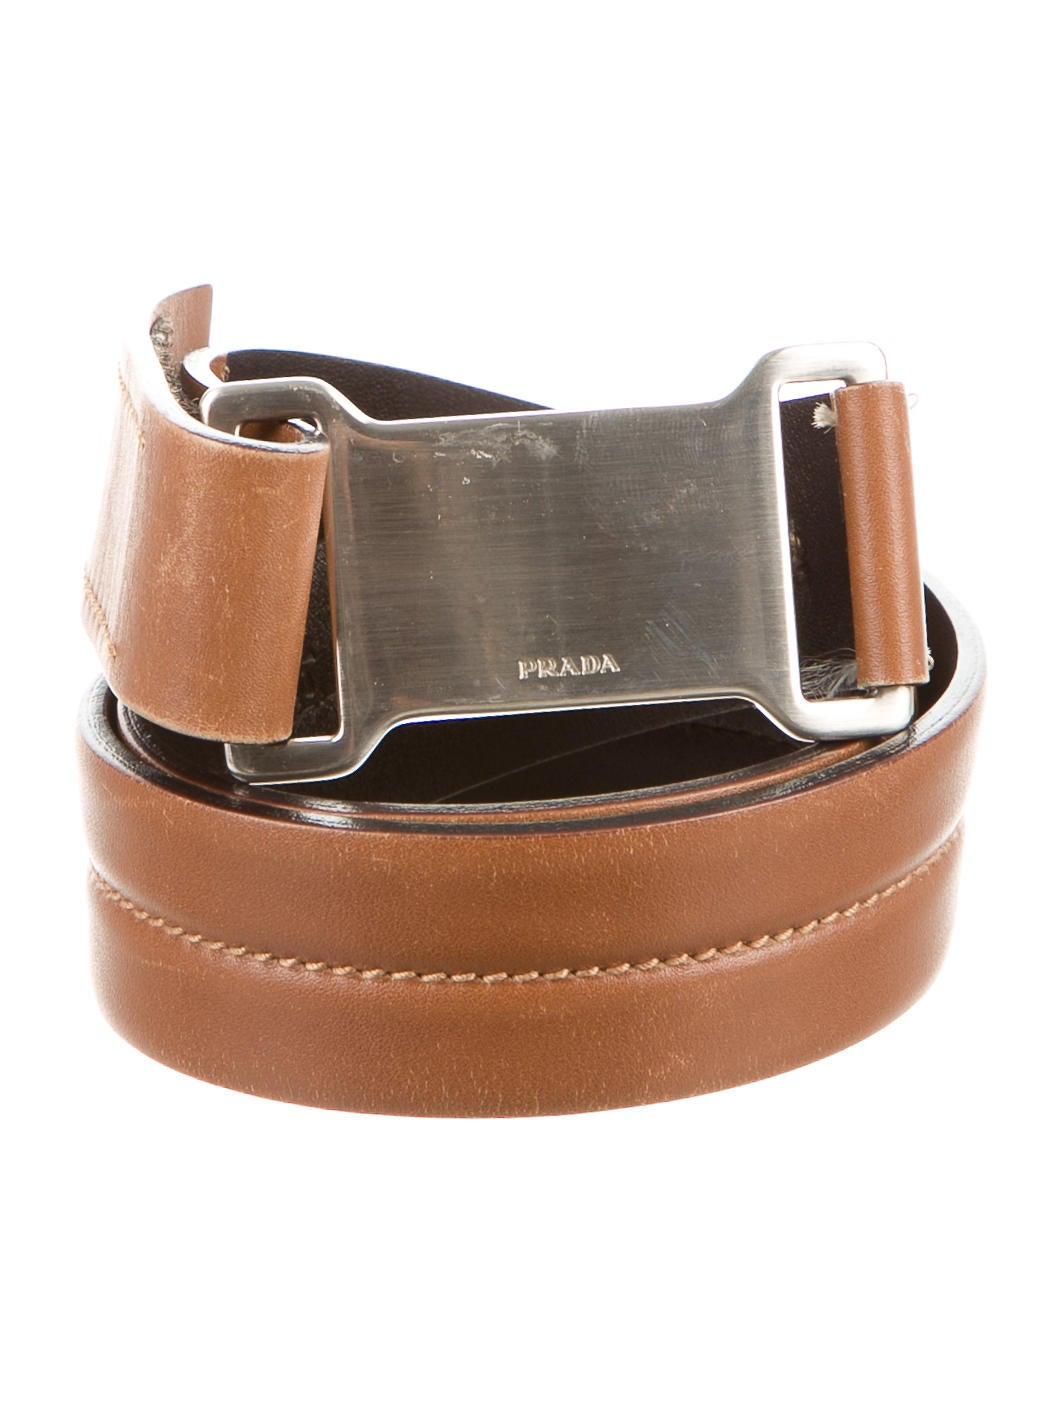 prada leather buckle belt accessories pra115860 the